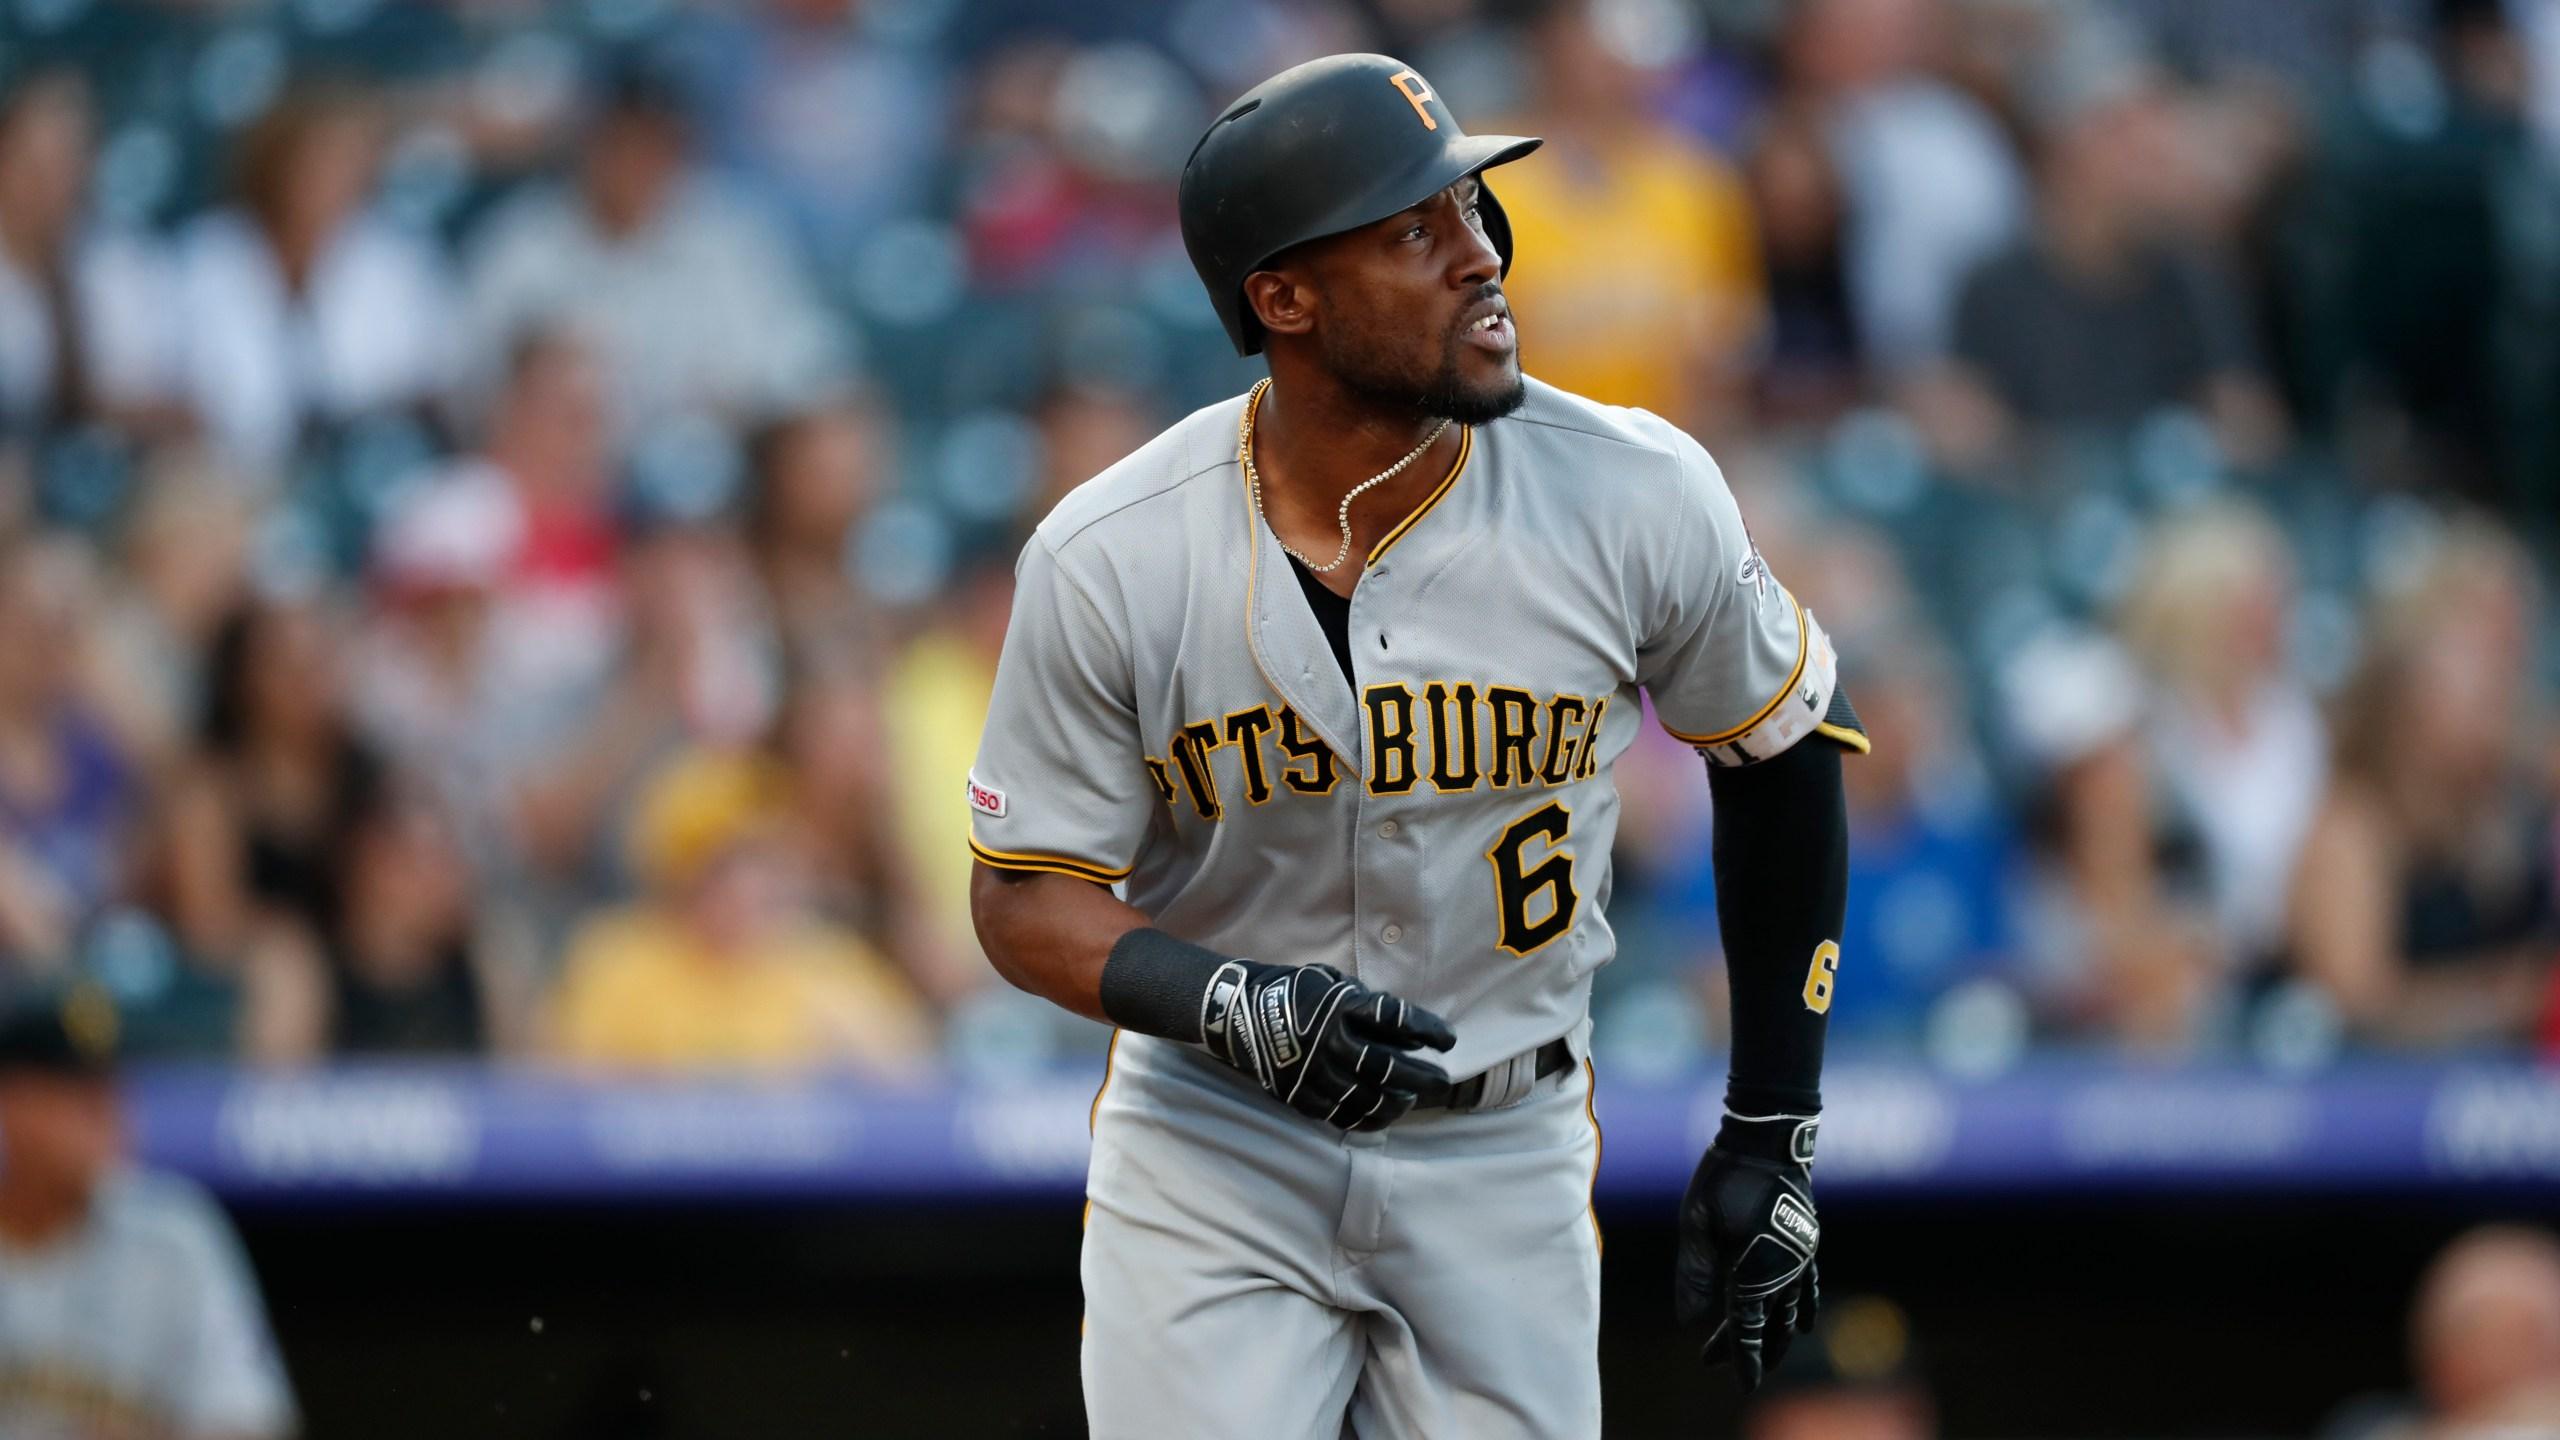 Pittsburgh Pirates center fielder Starling Marte (6), r m